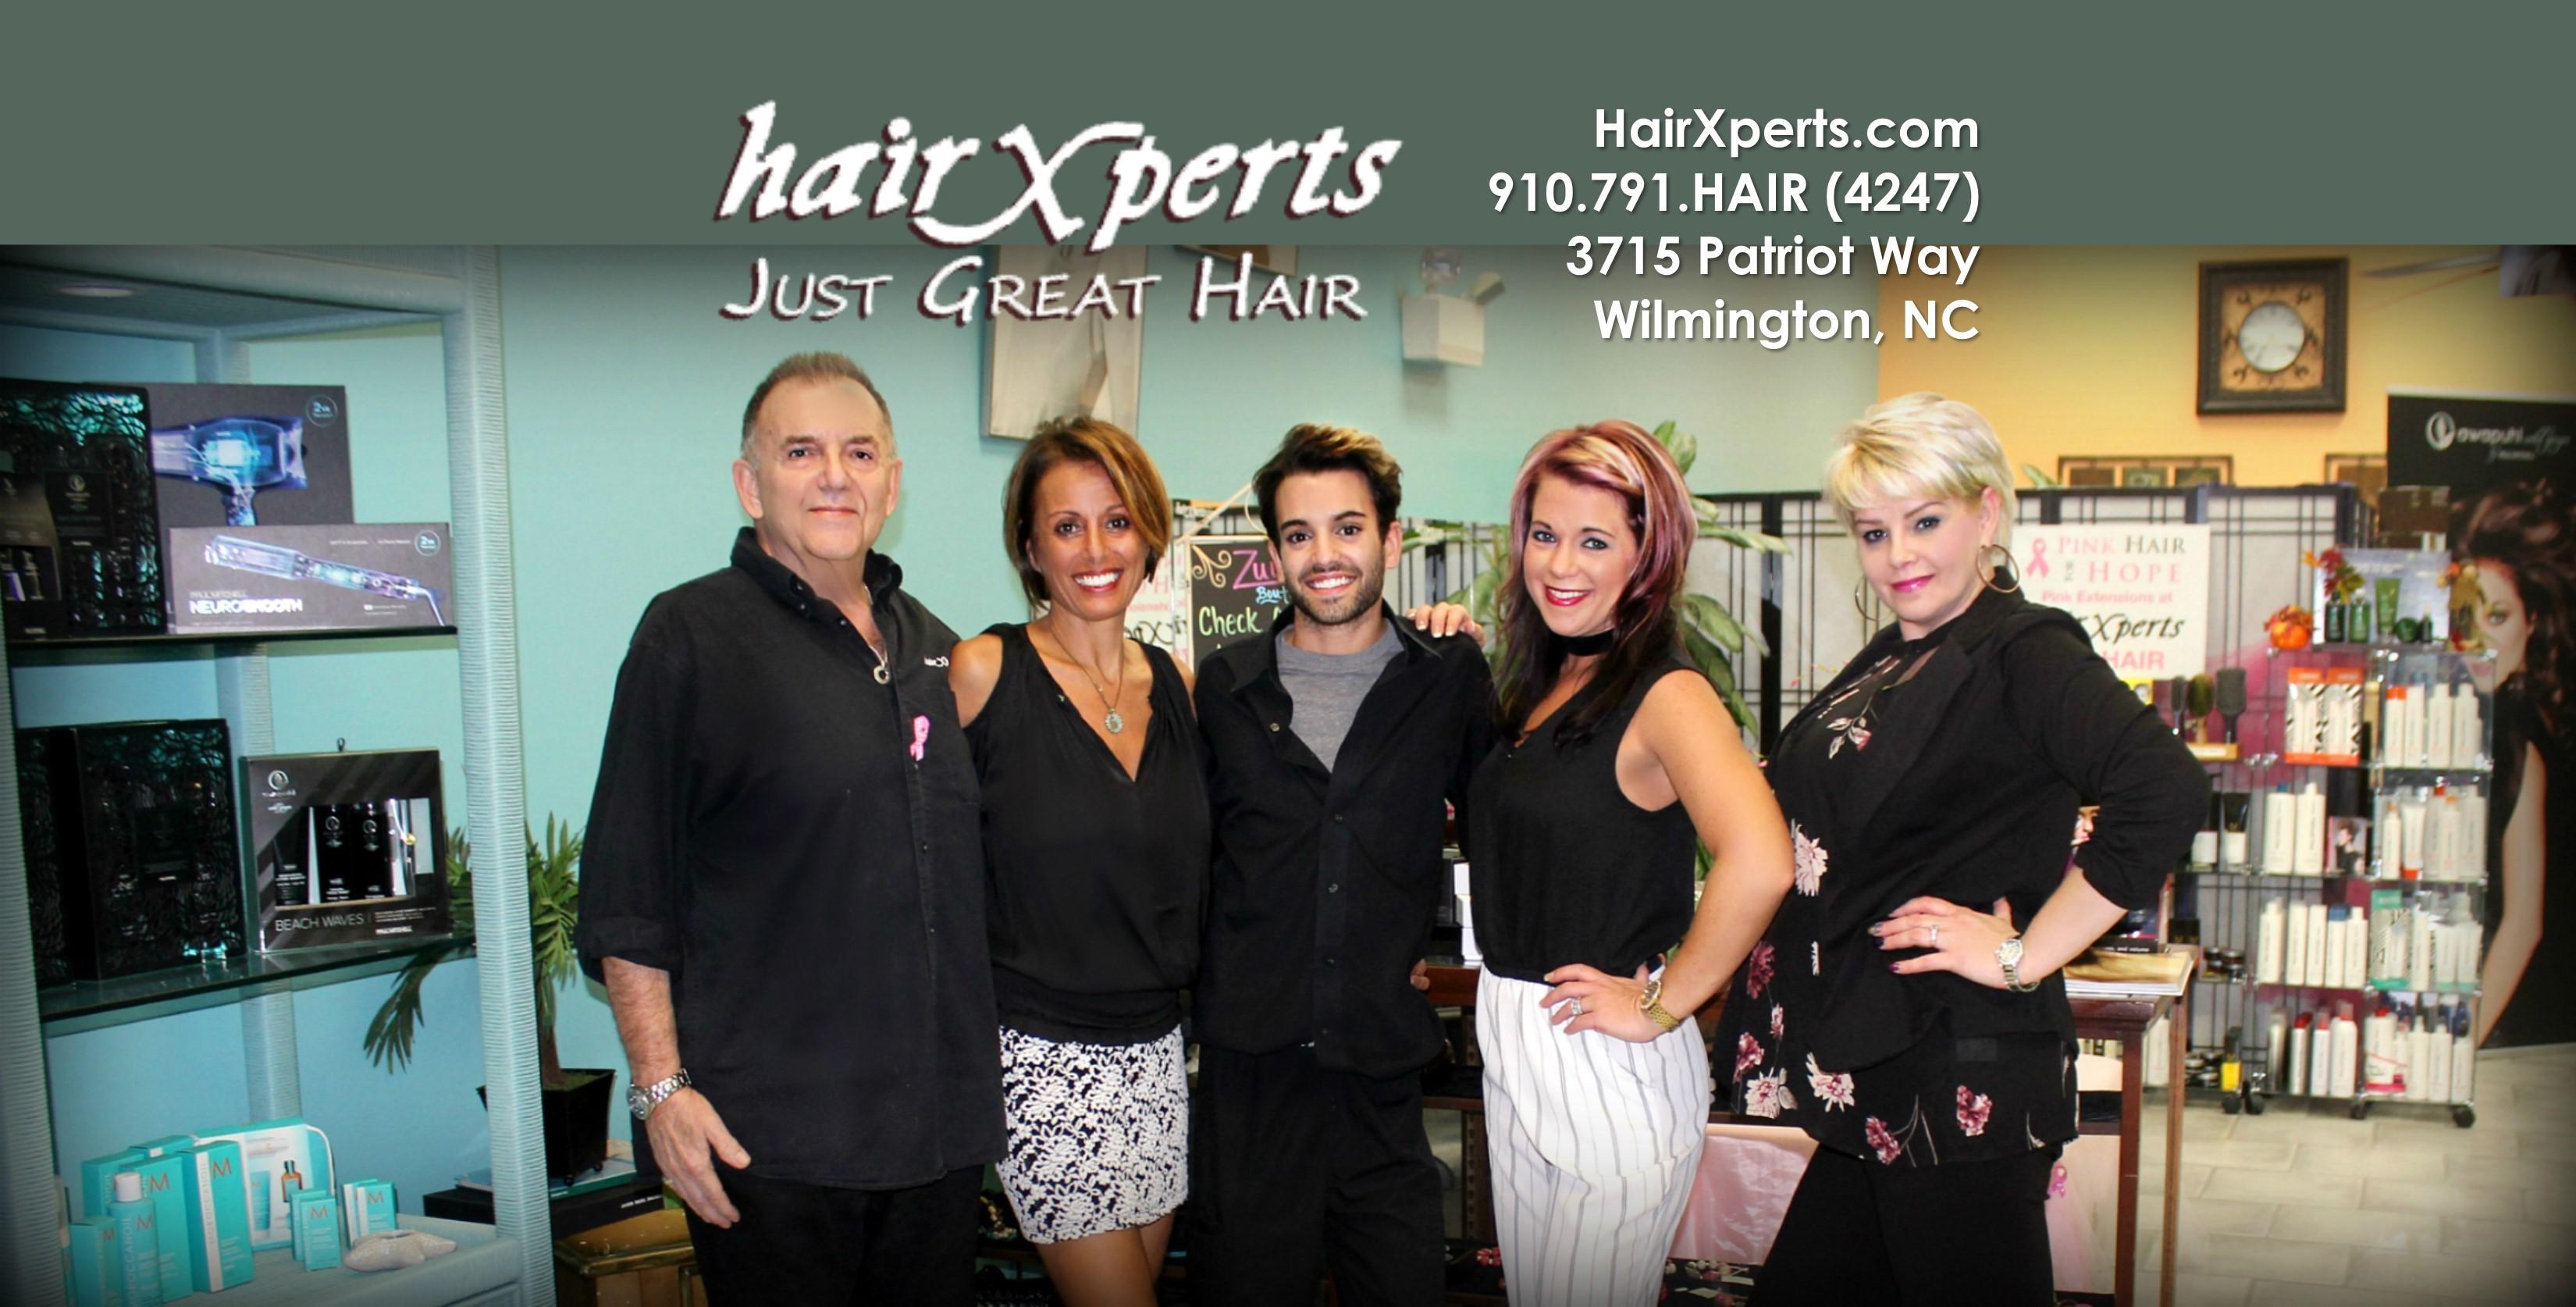 HairXperts Salon